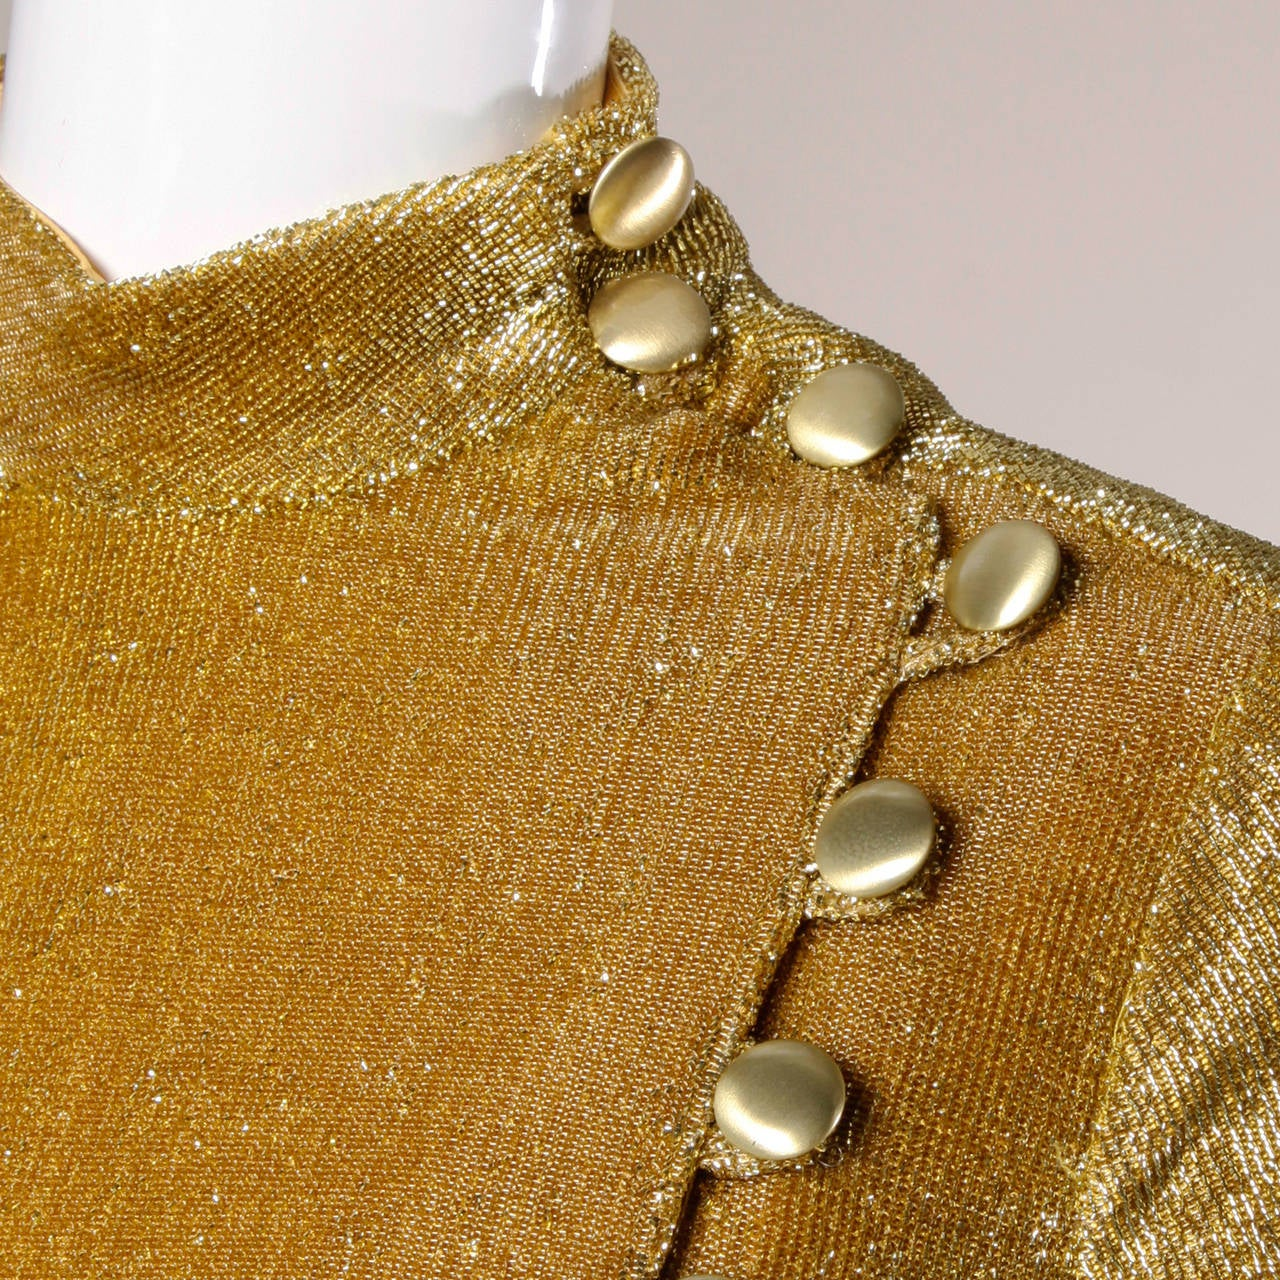 Mr. Mort Vintage 1960s Metallic Gold Lurex Coat Dress 5